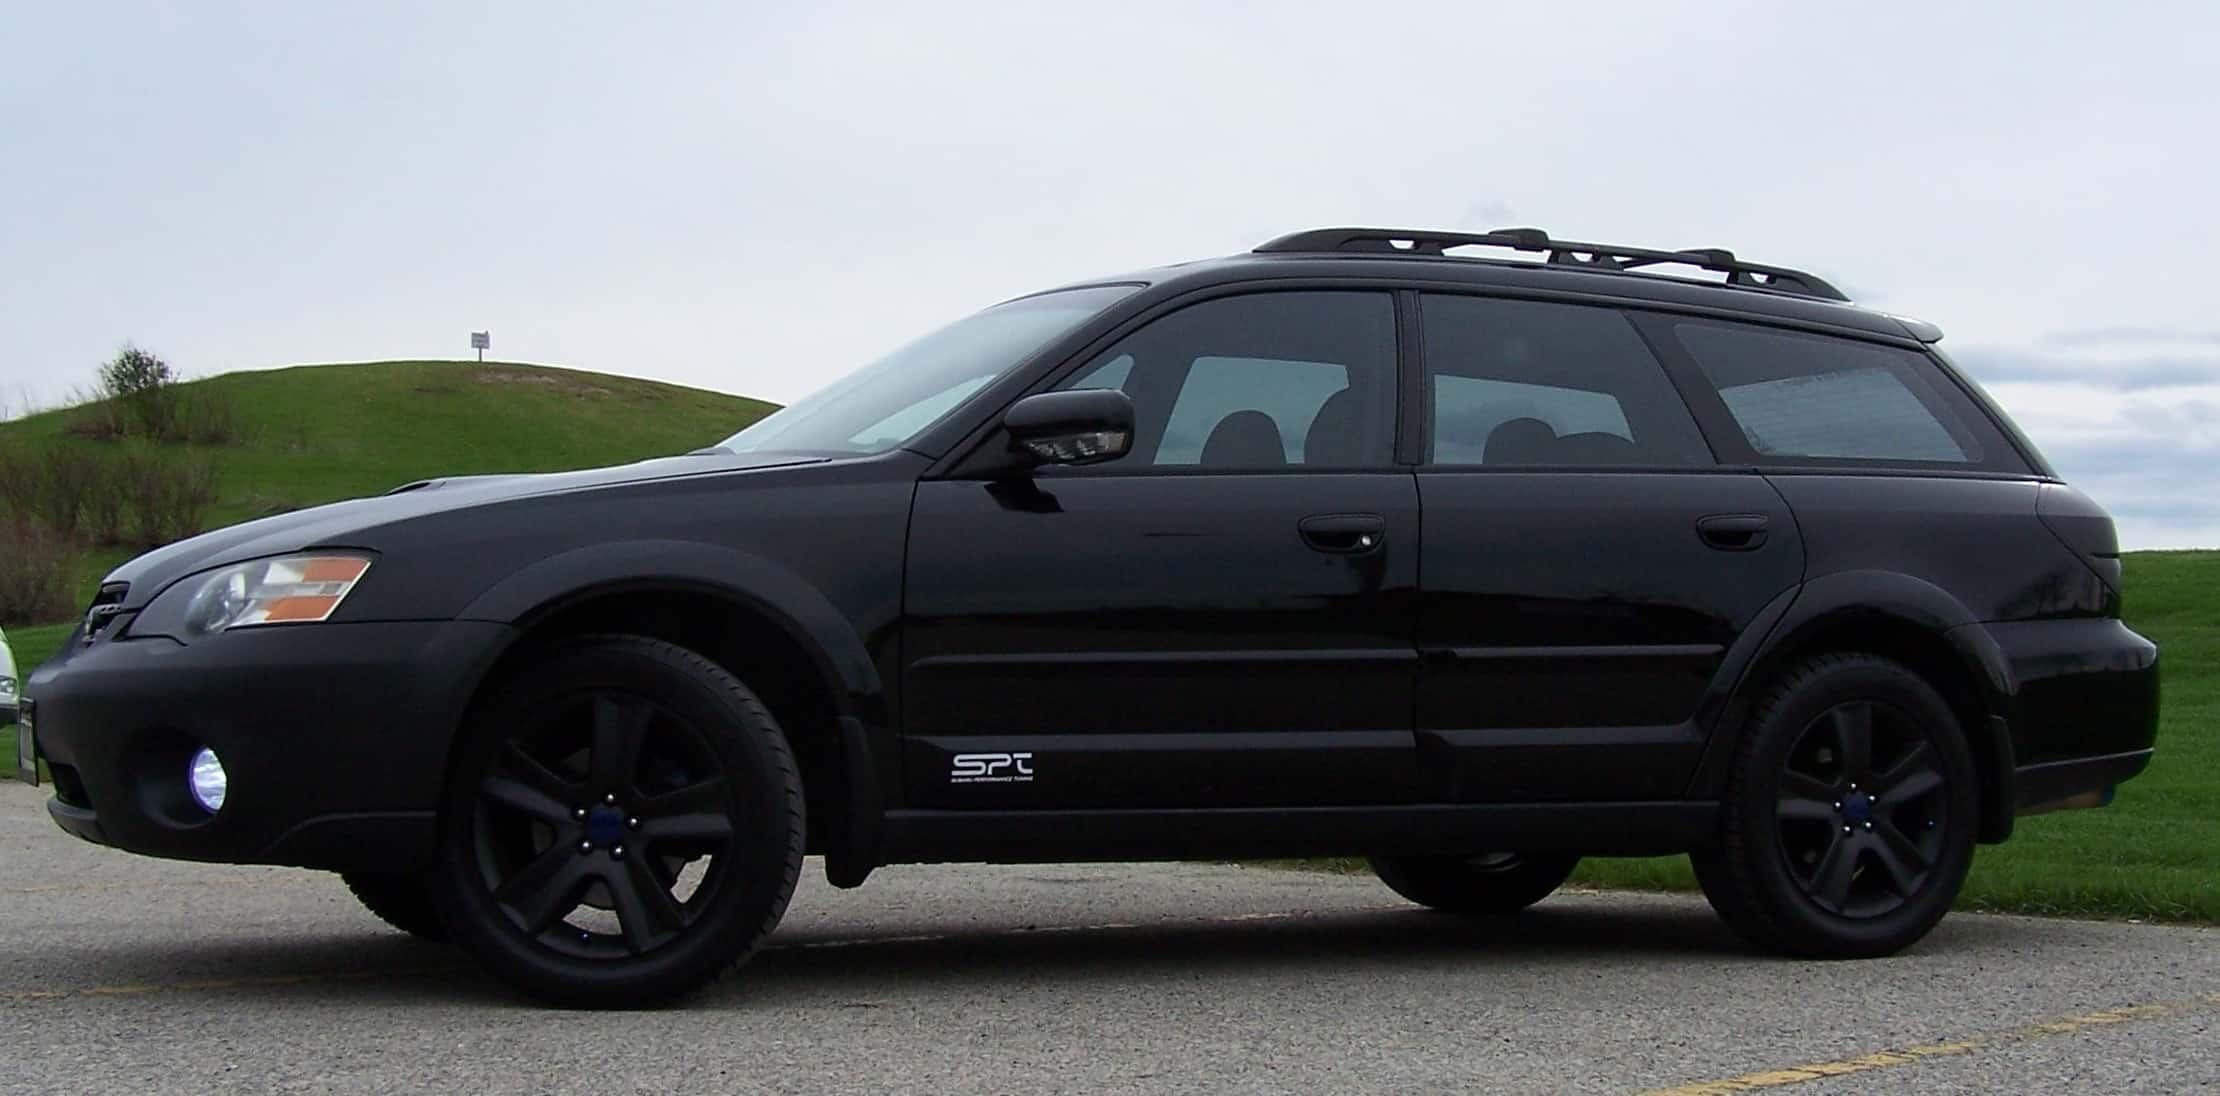 Subaru Outbacks are better cars under 5000 than the Subaru WRX.